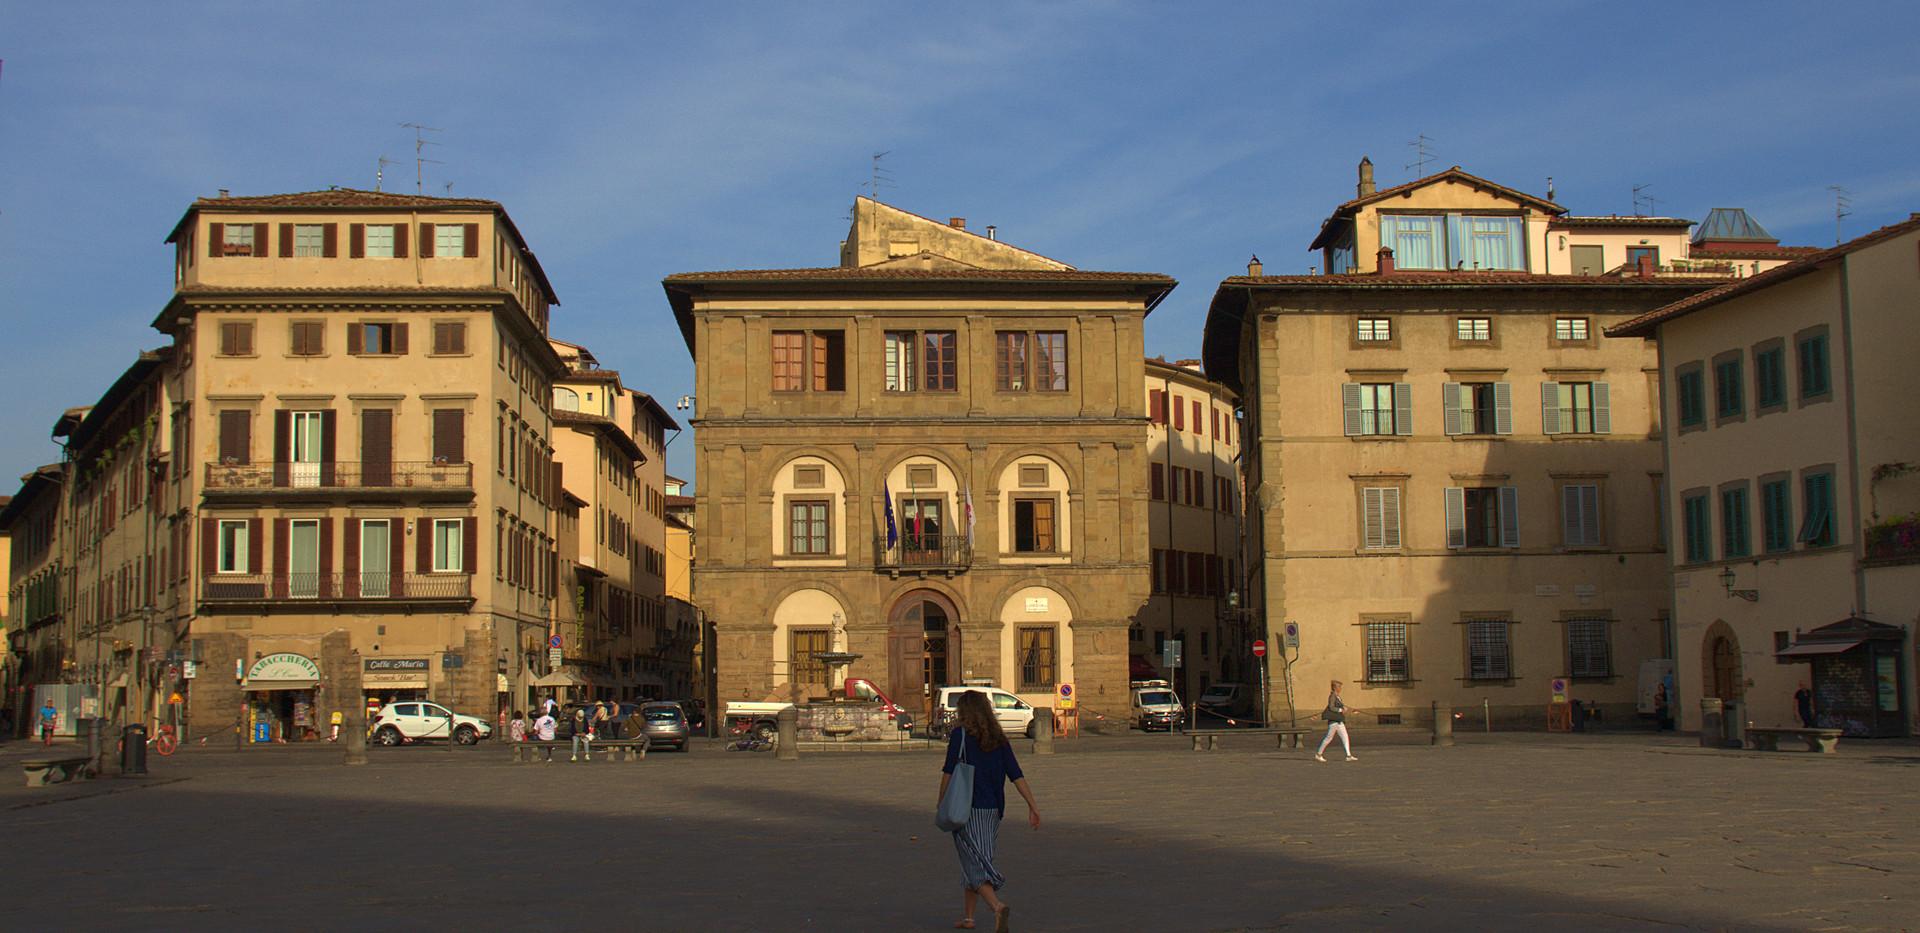 piazzasantacroce.jpg